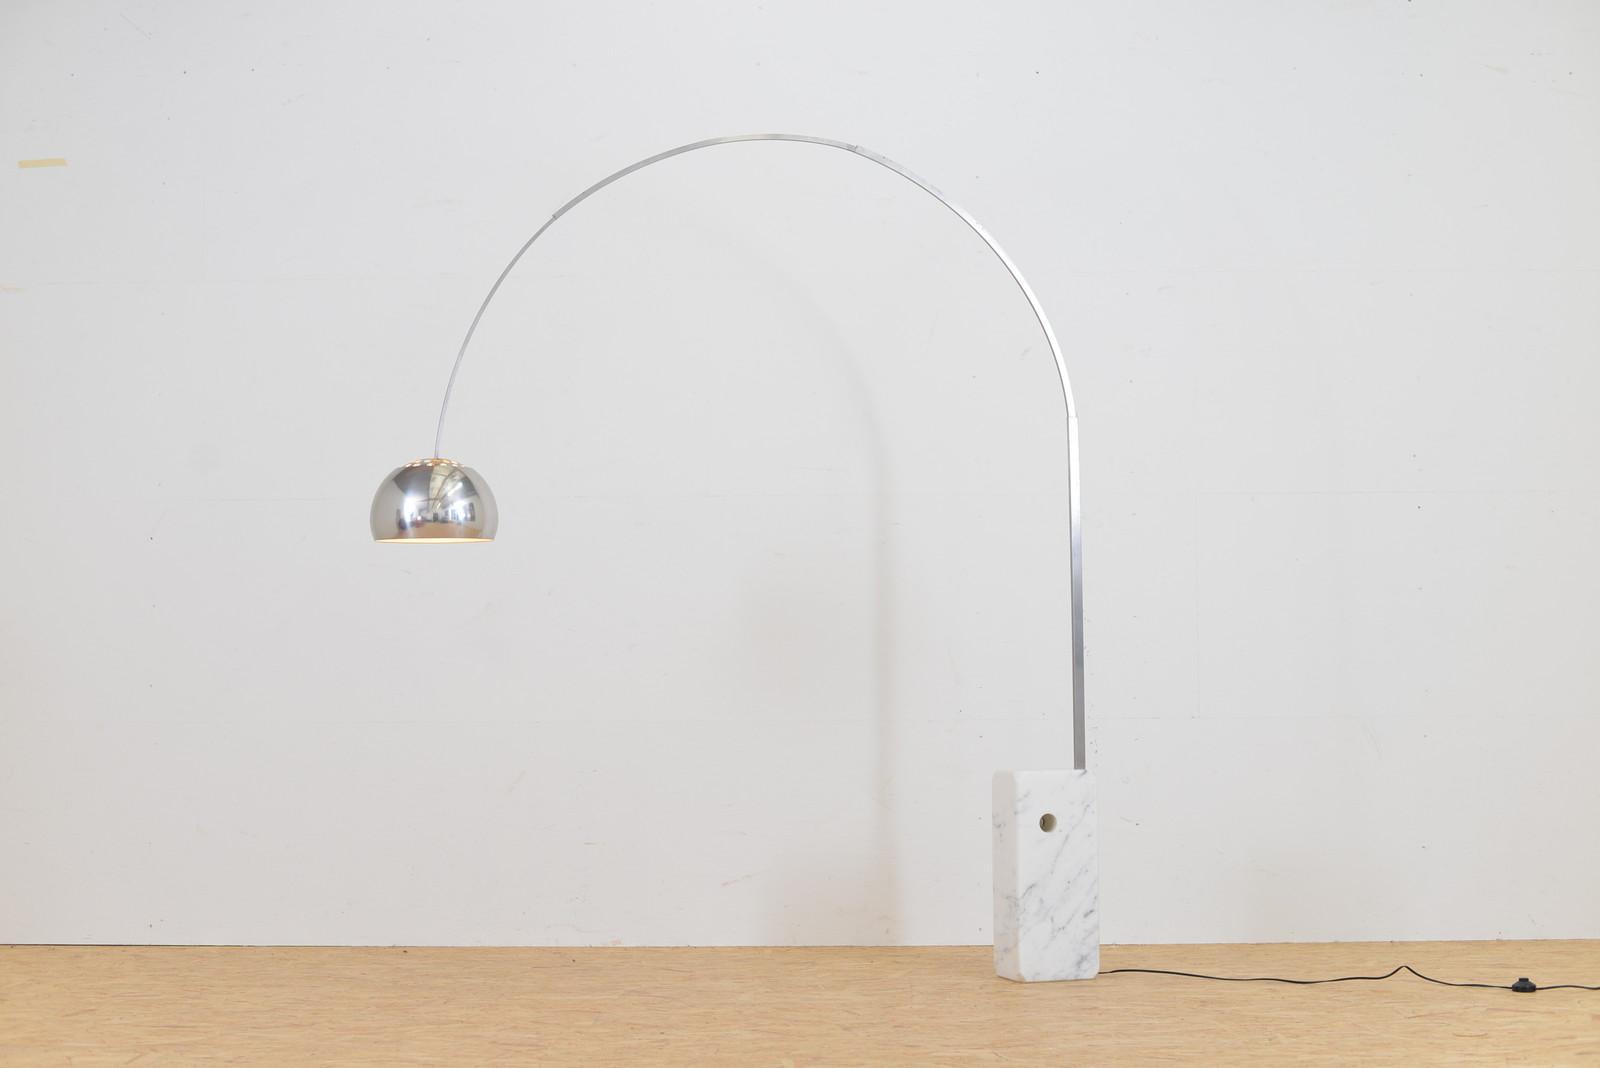 flos lampe gebraucht elegant remarquable arco lampe arco lampe flos with flos lampe gebraucht. Black Bedroom Furniture Sets. Home Design Ideas